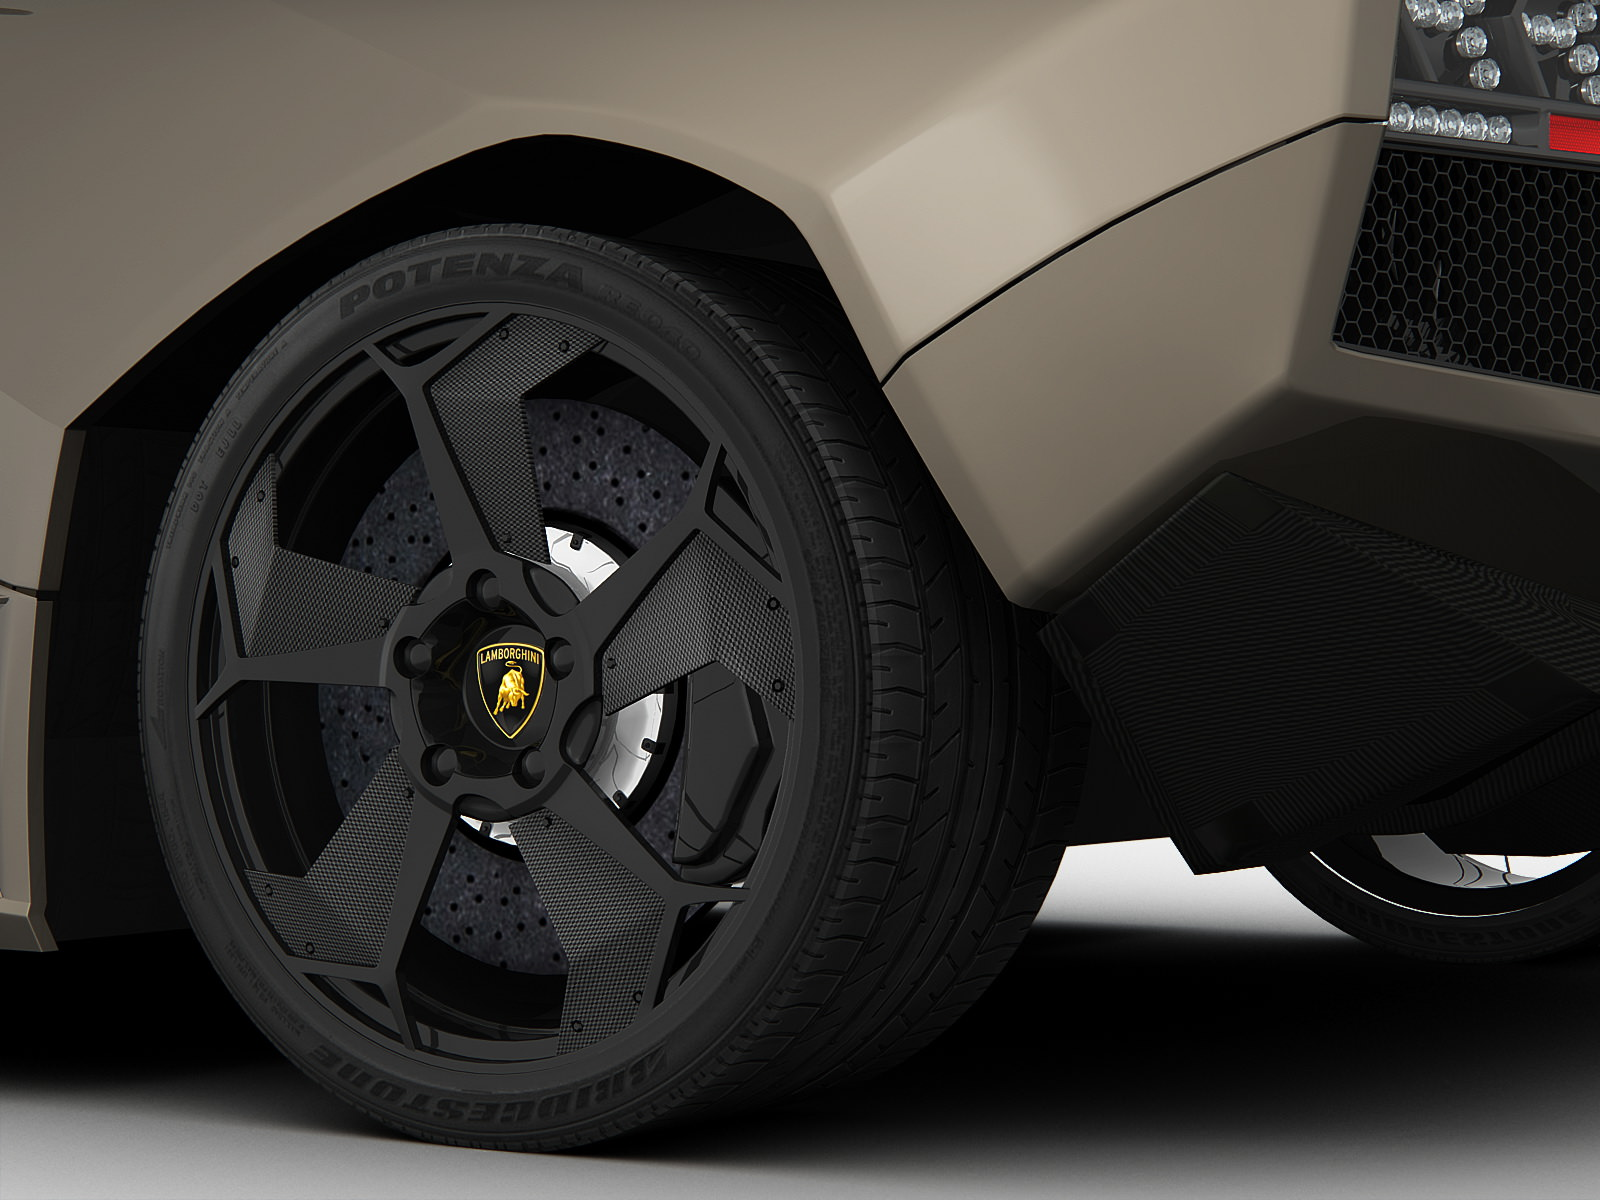 Lamborghini reventon 3d model max obj 3ds c4d for Lamborghini reventon interior